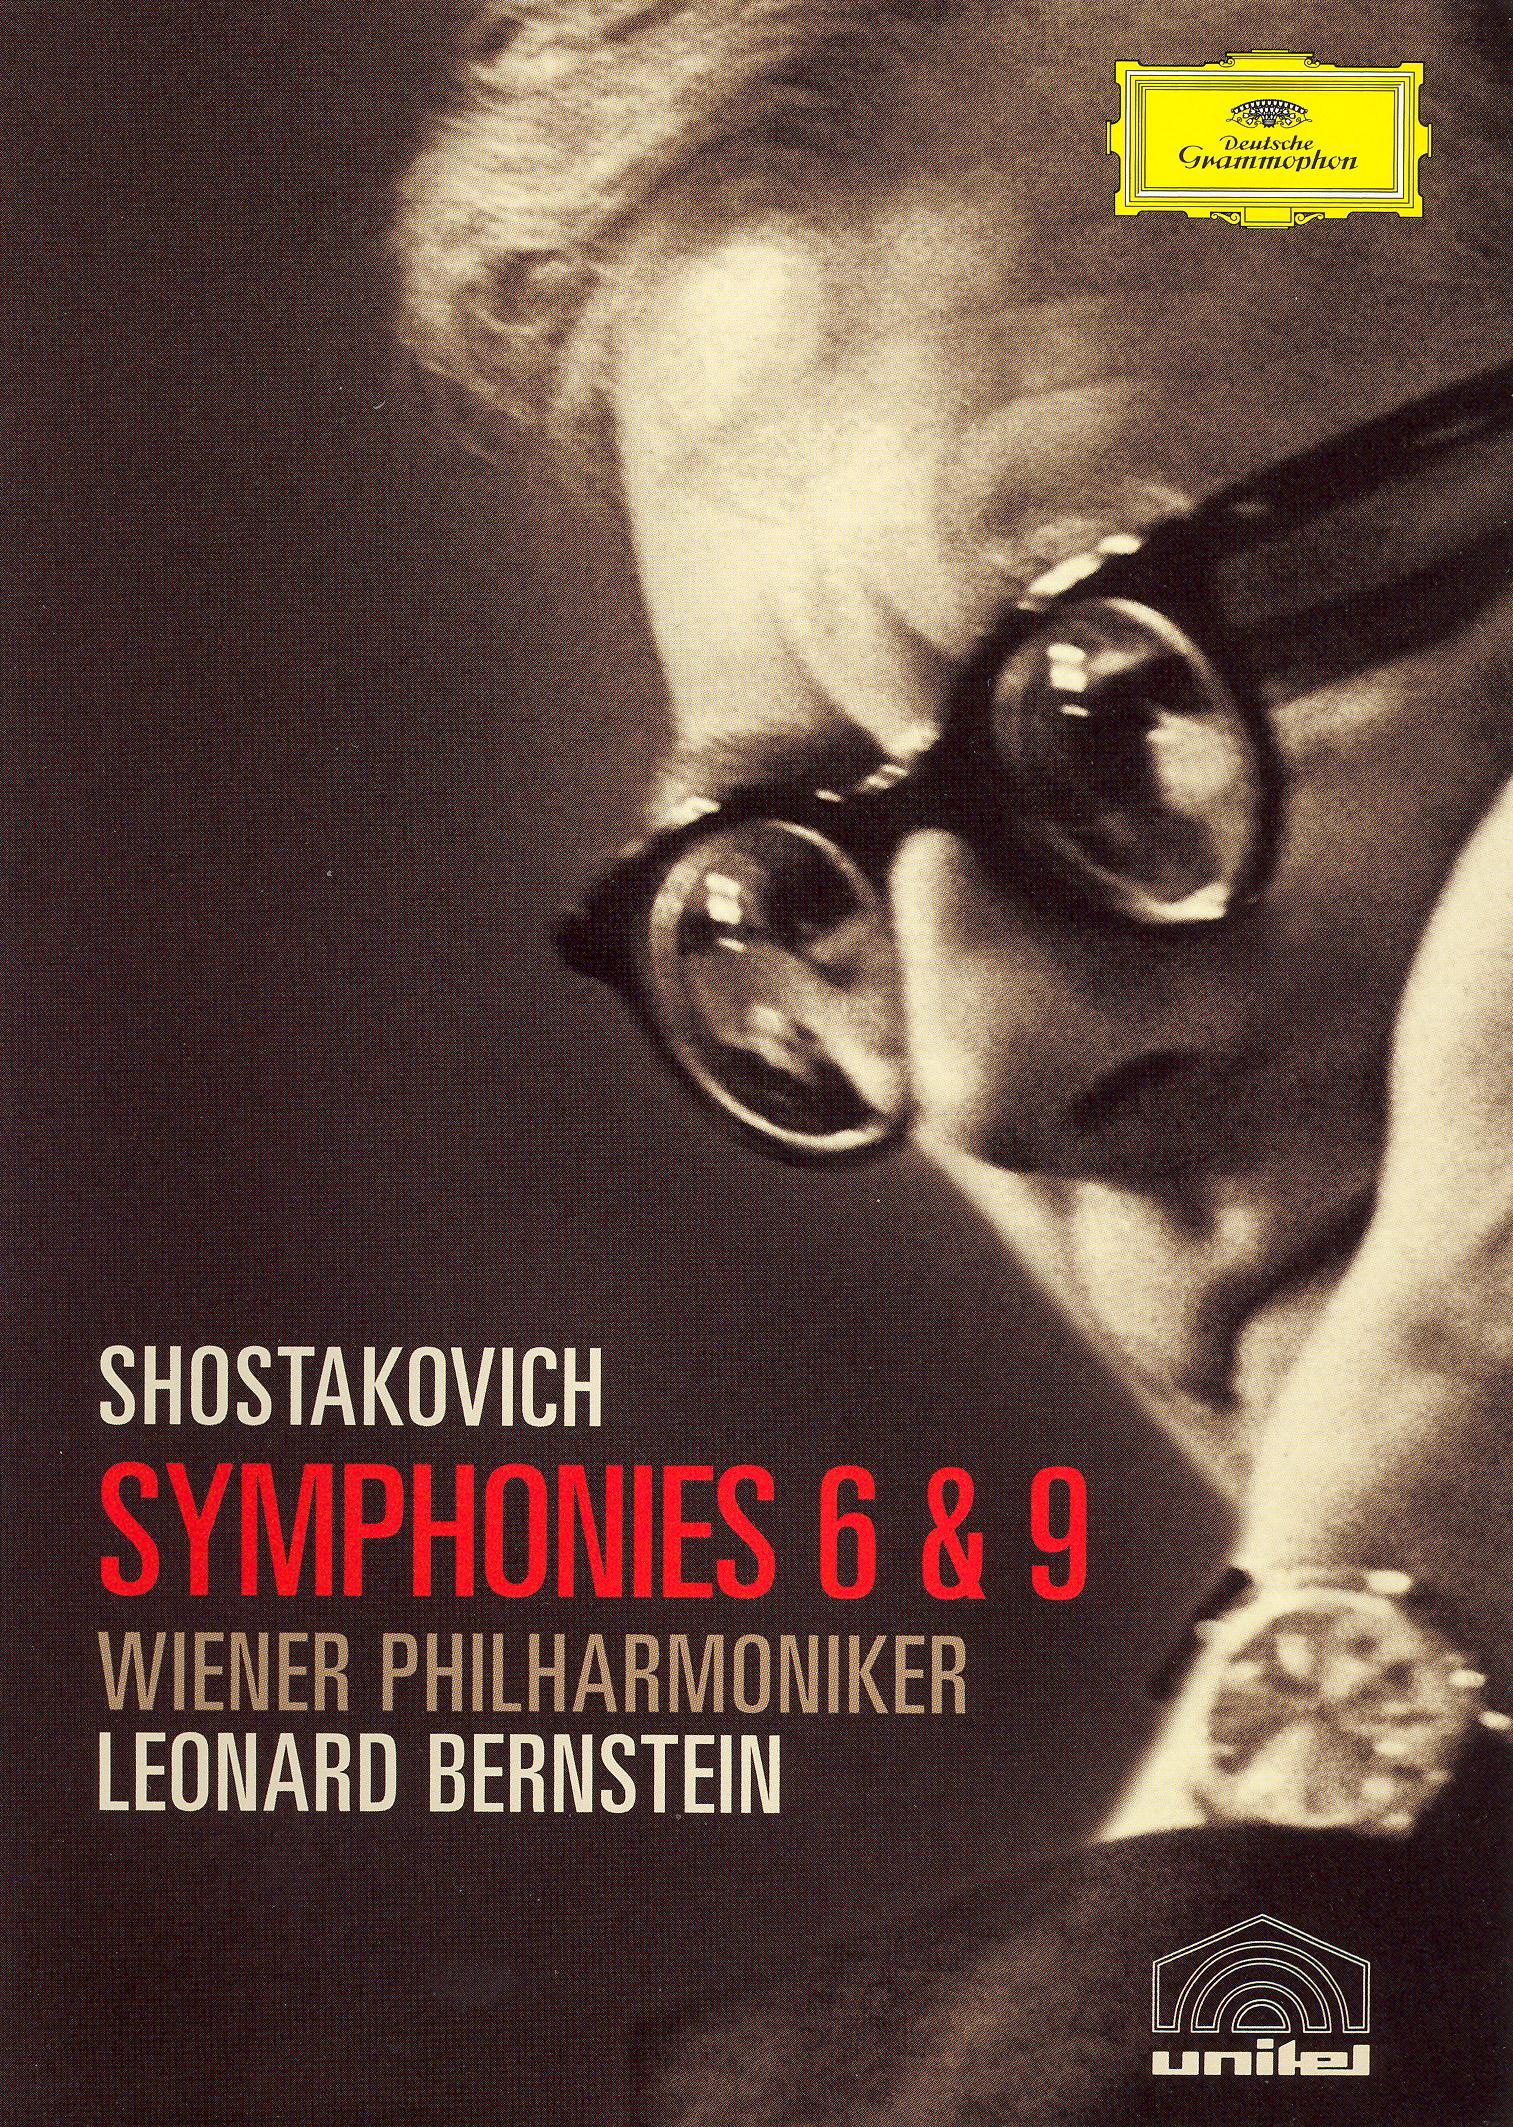 Shostakovich: Symphonies 6 & 9